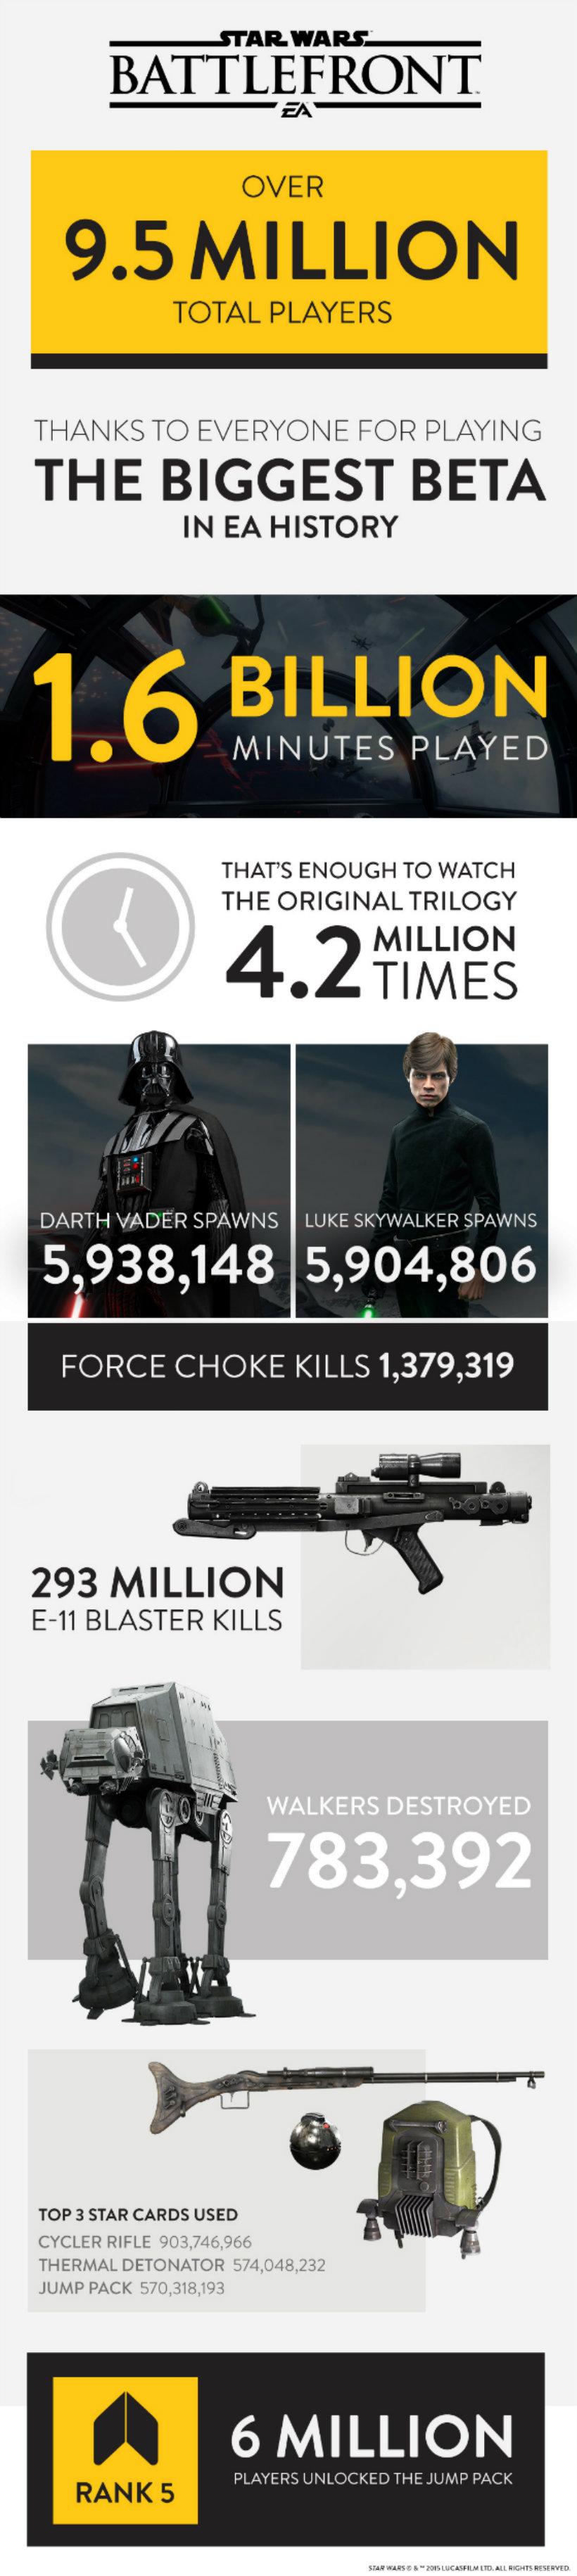 Battlefront beta infographic